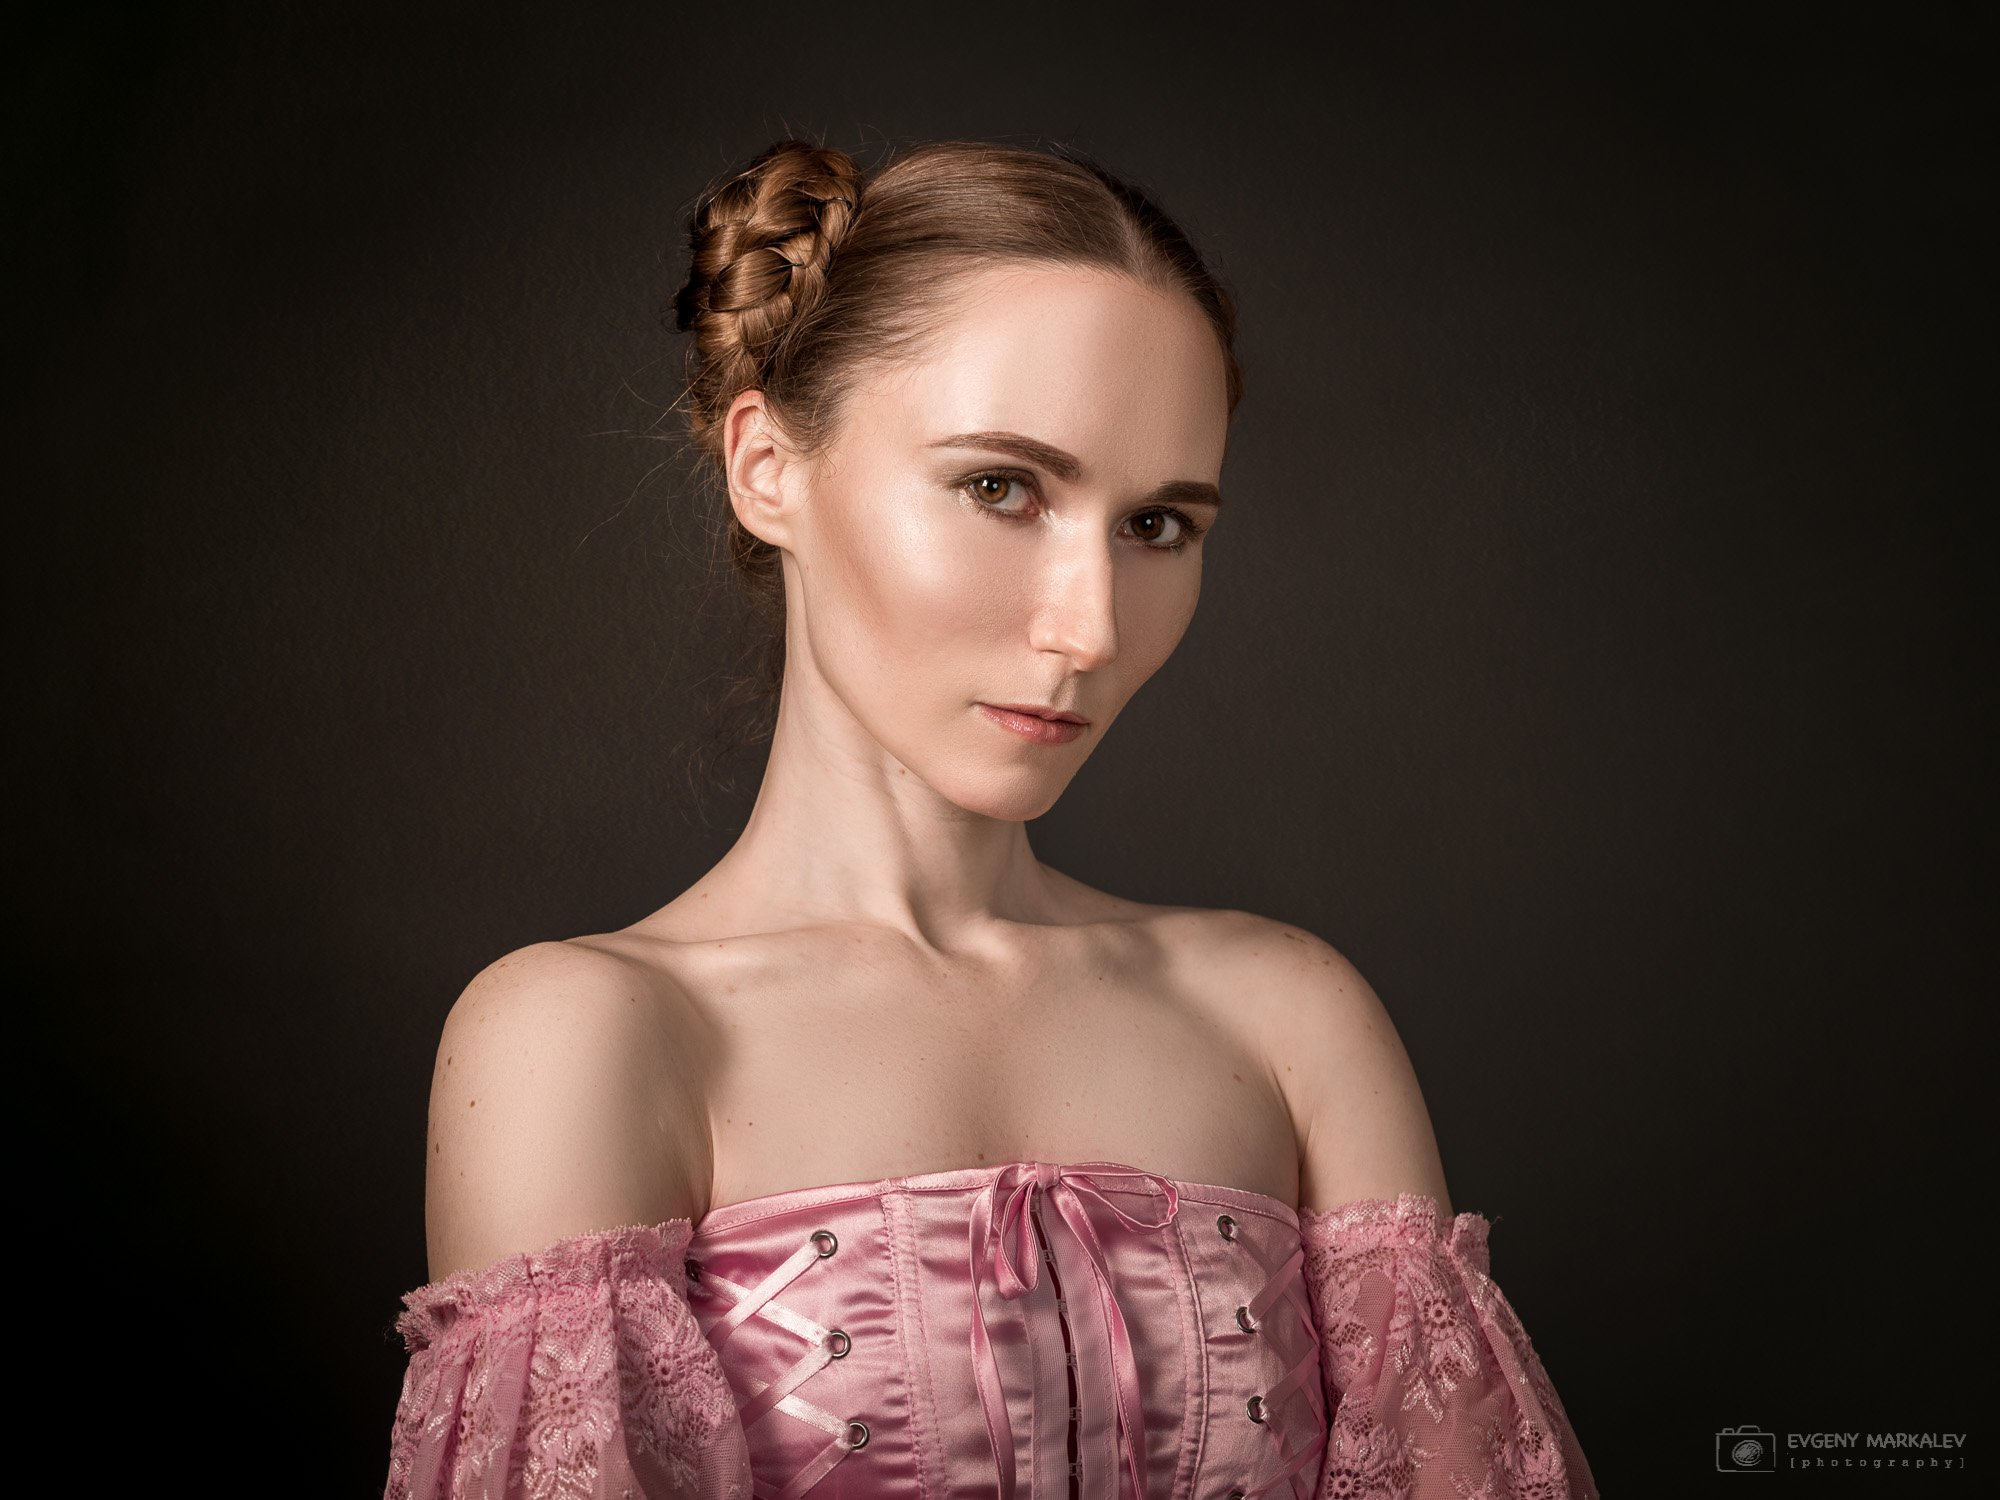 портрет, студийная съемка, девушка, Евгений Маркалев